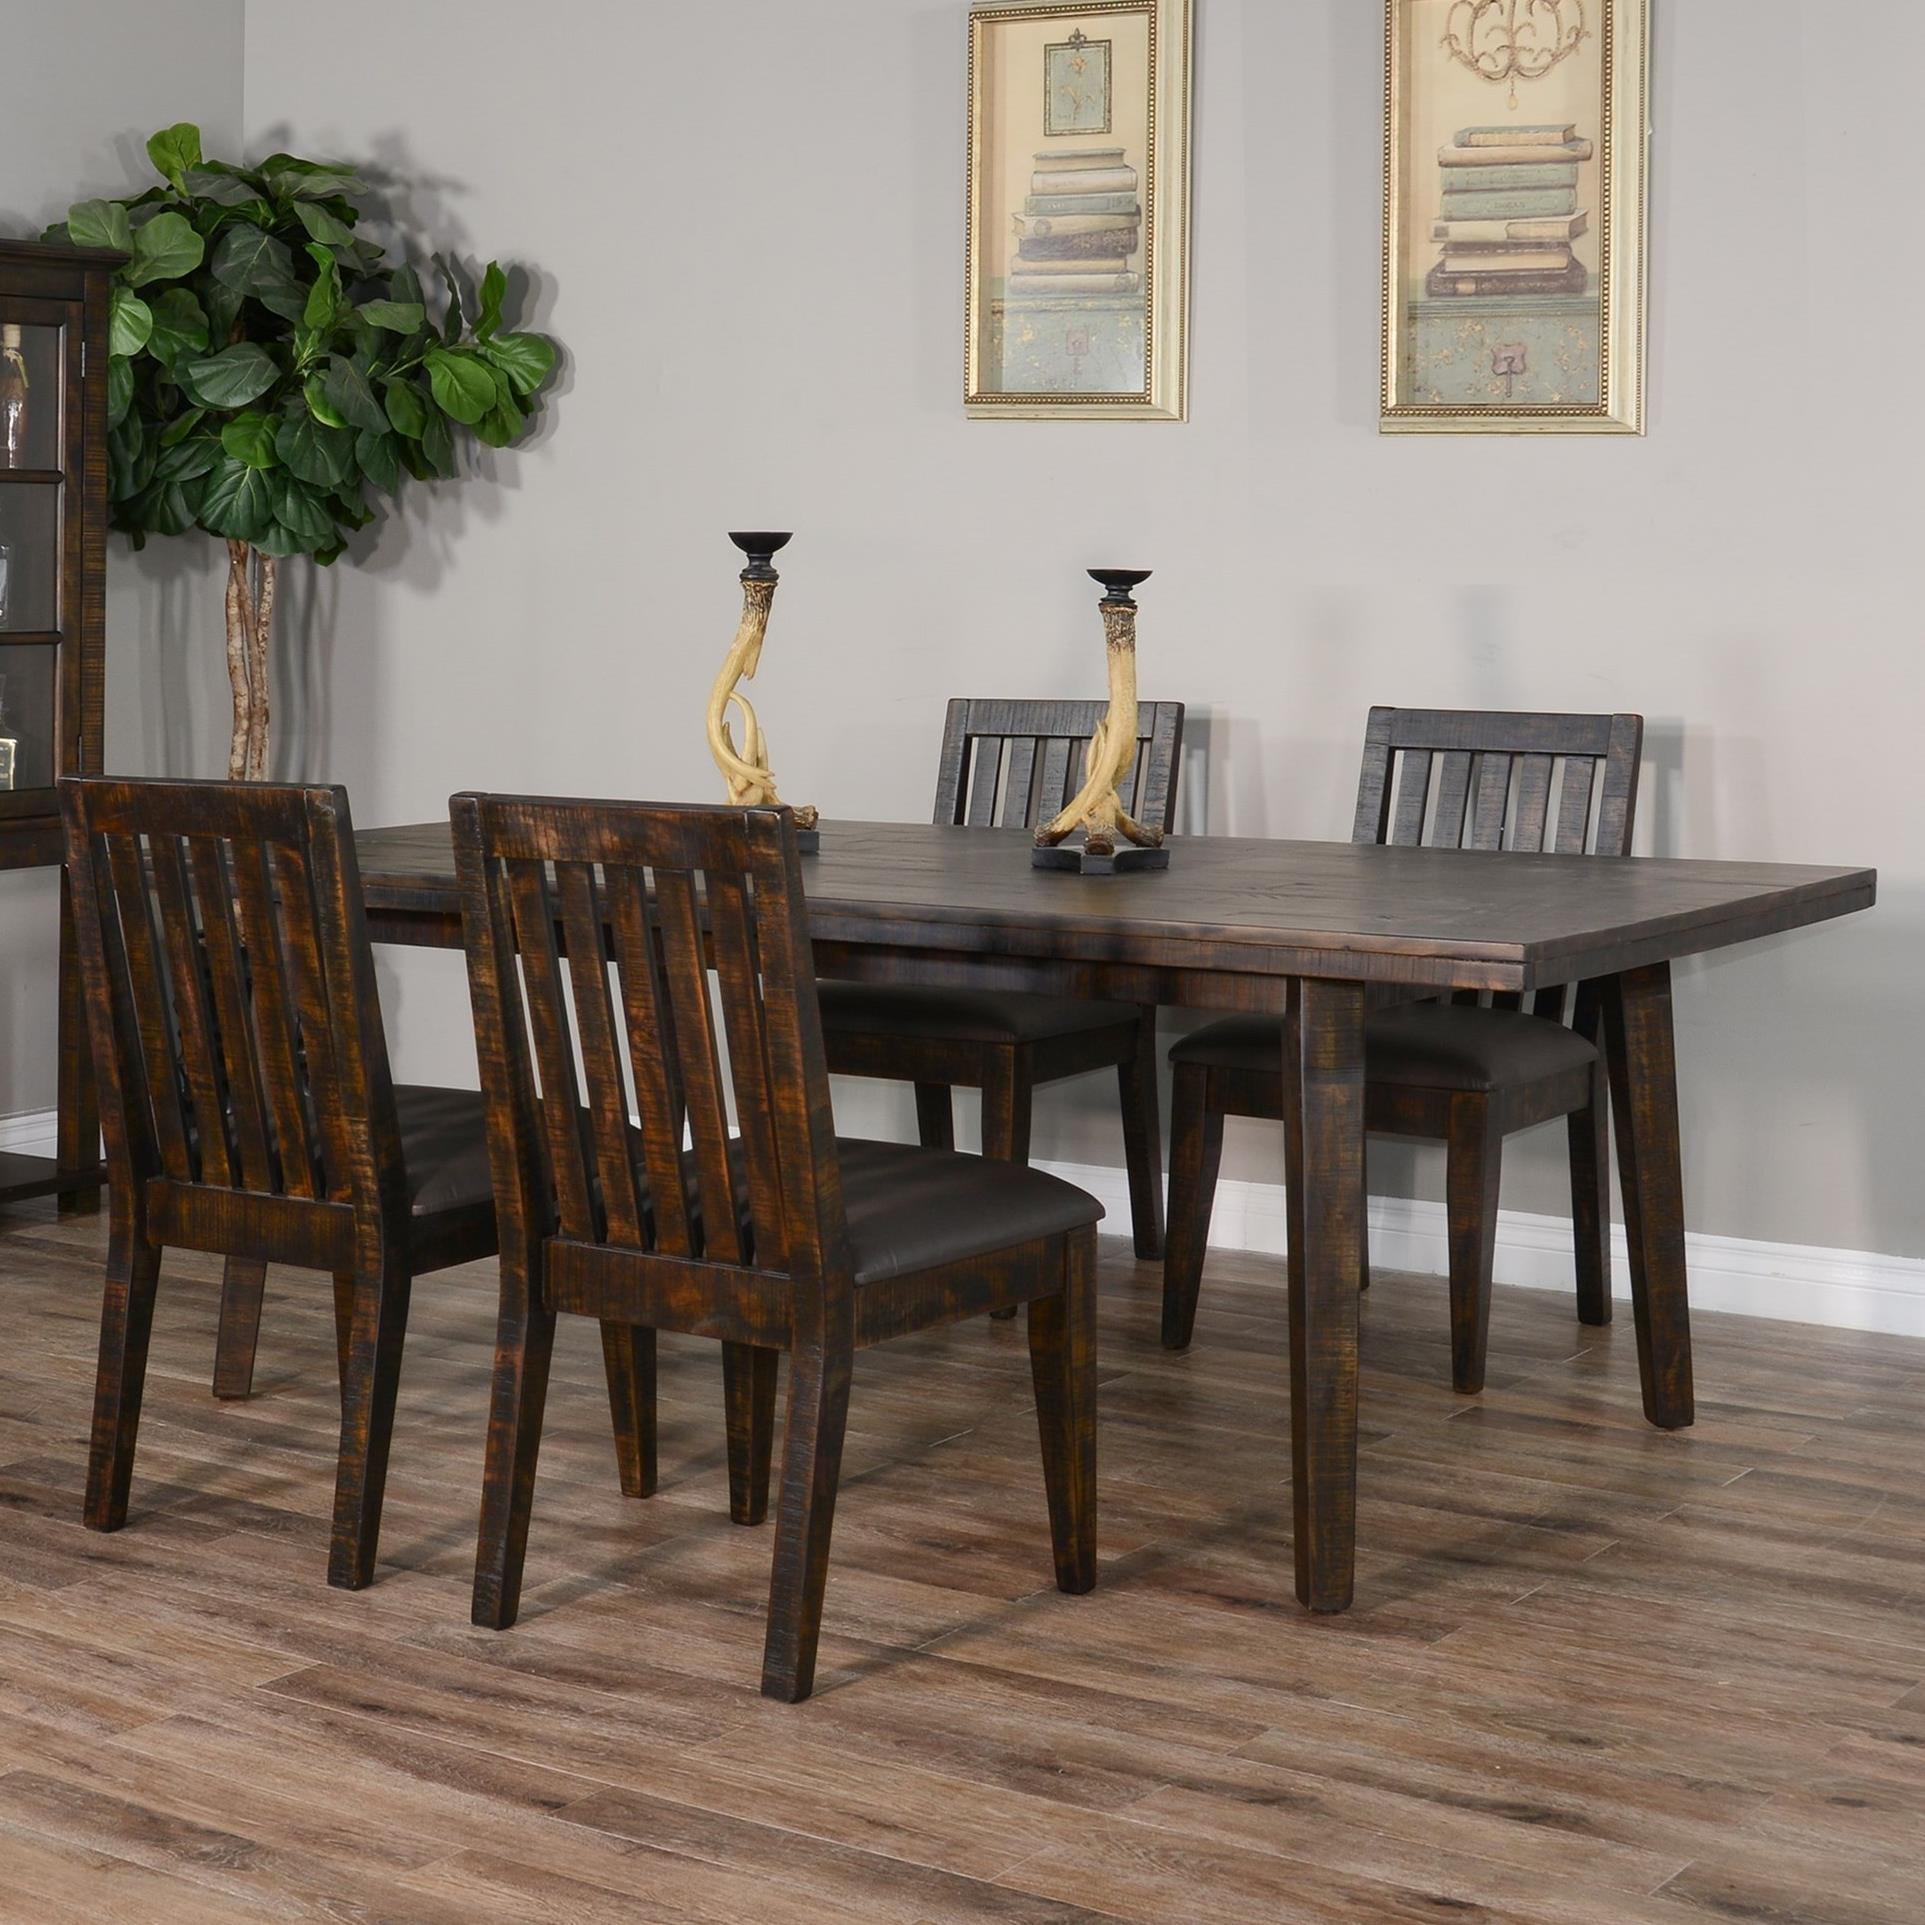 Rustic 5-Piece Table Set